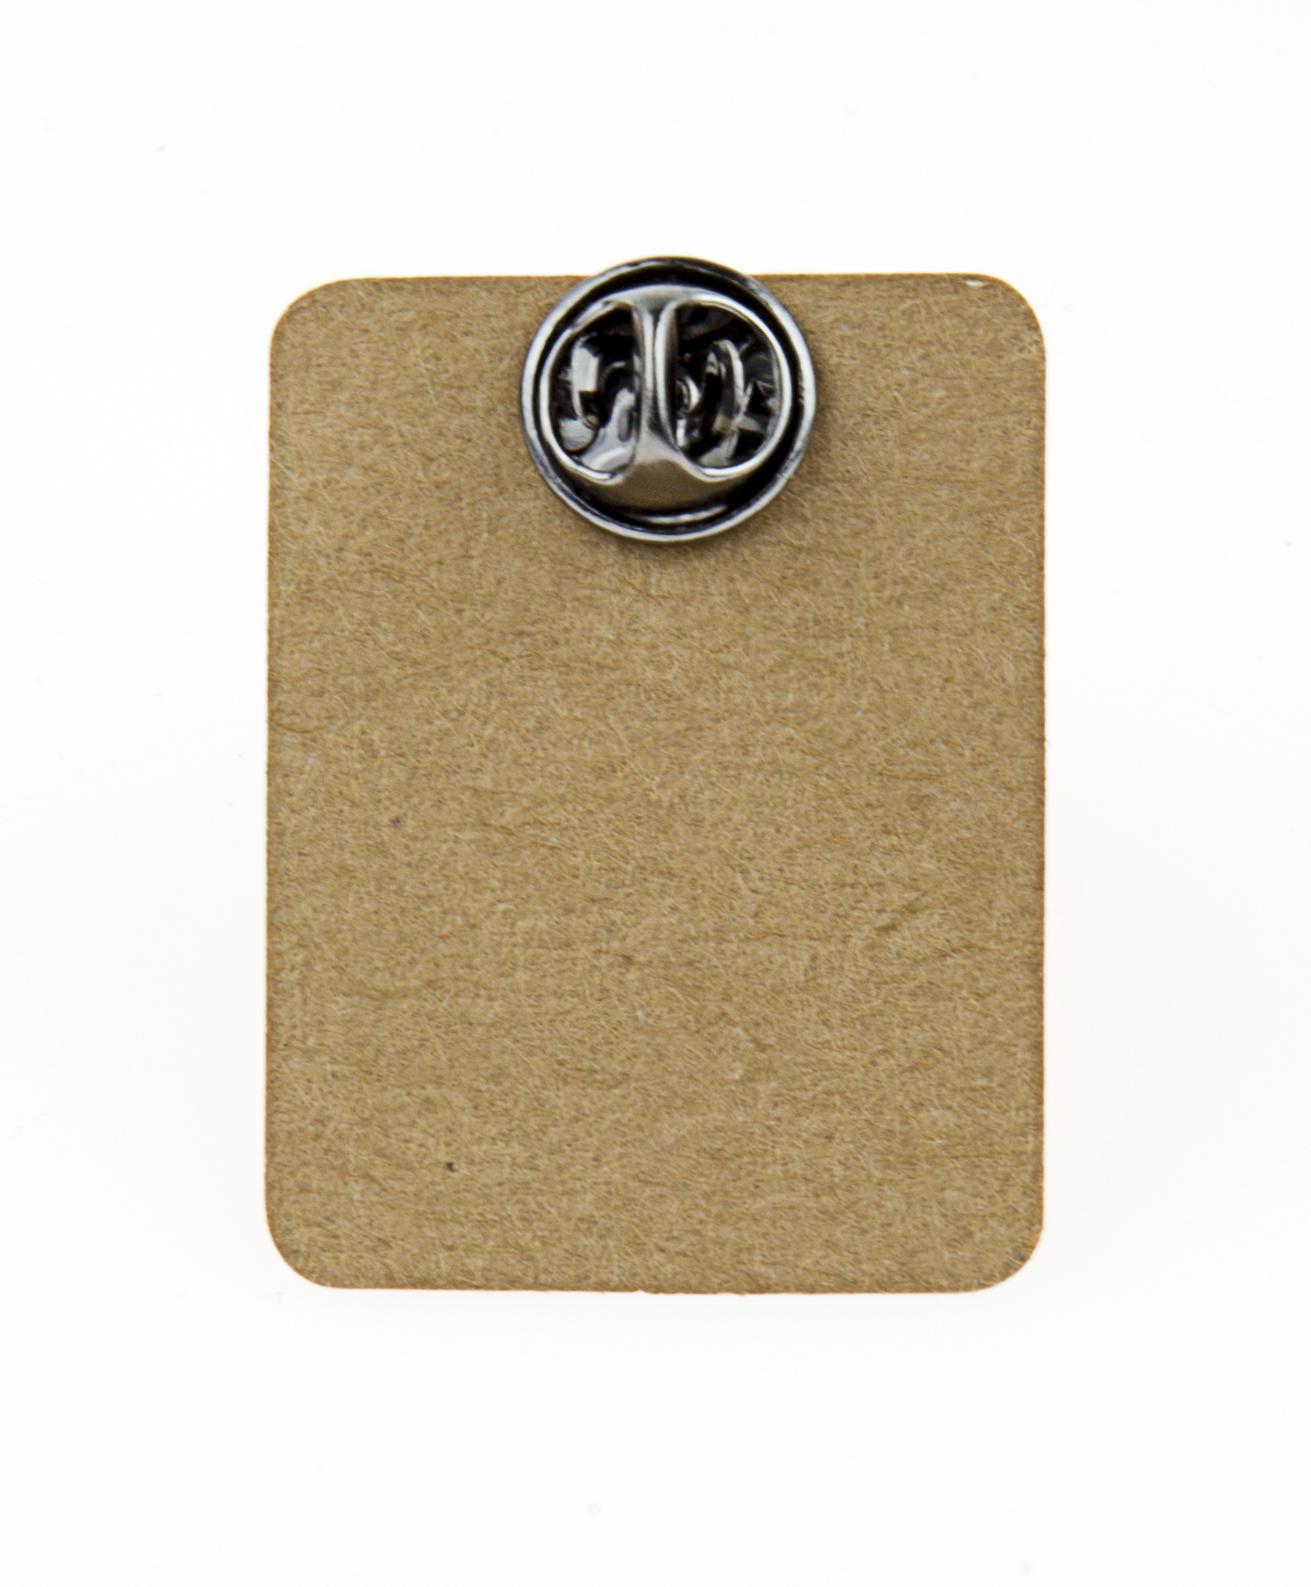 Metal Black and White Cat Enamel Pin Badge